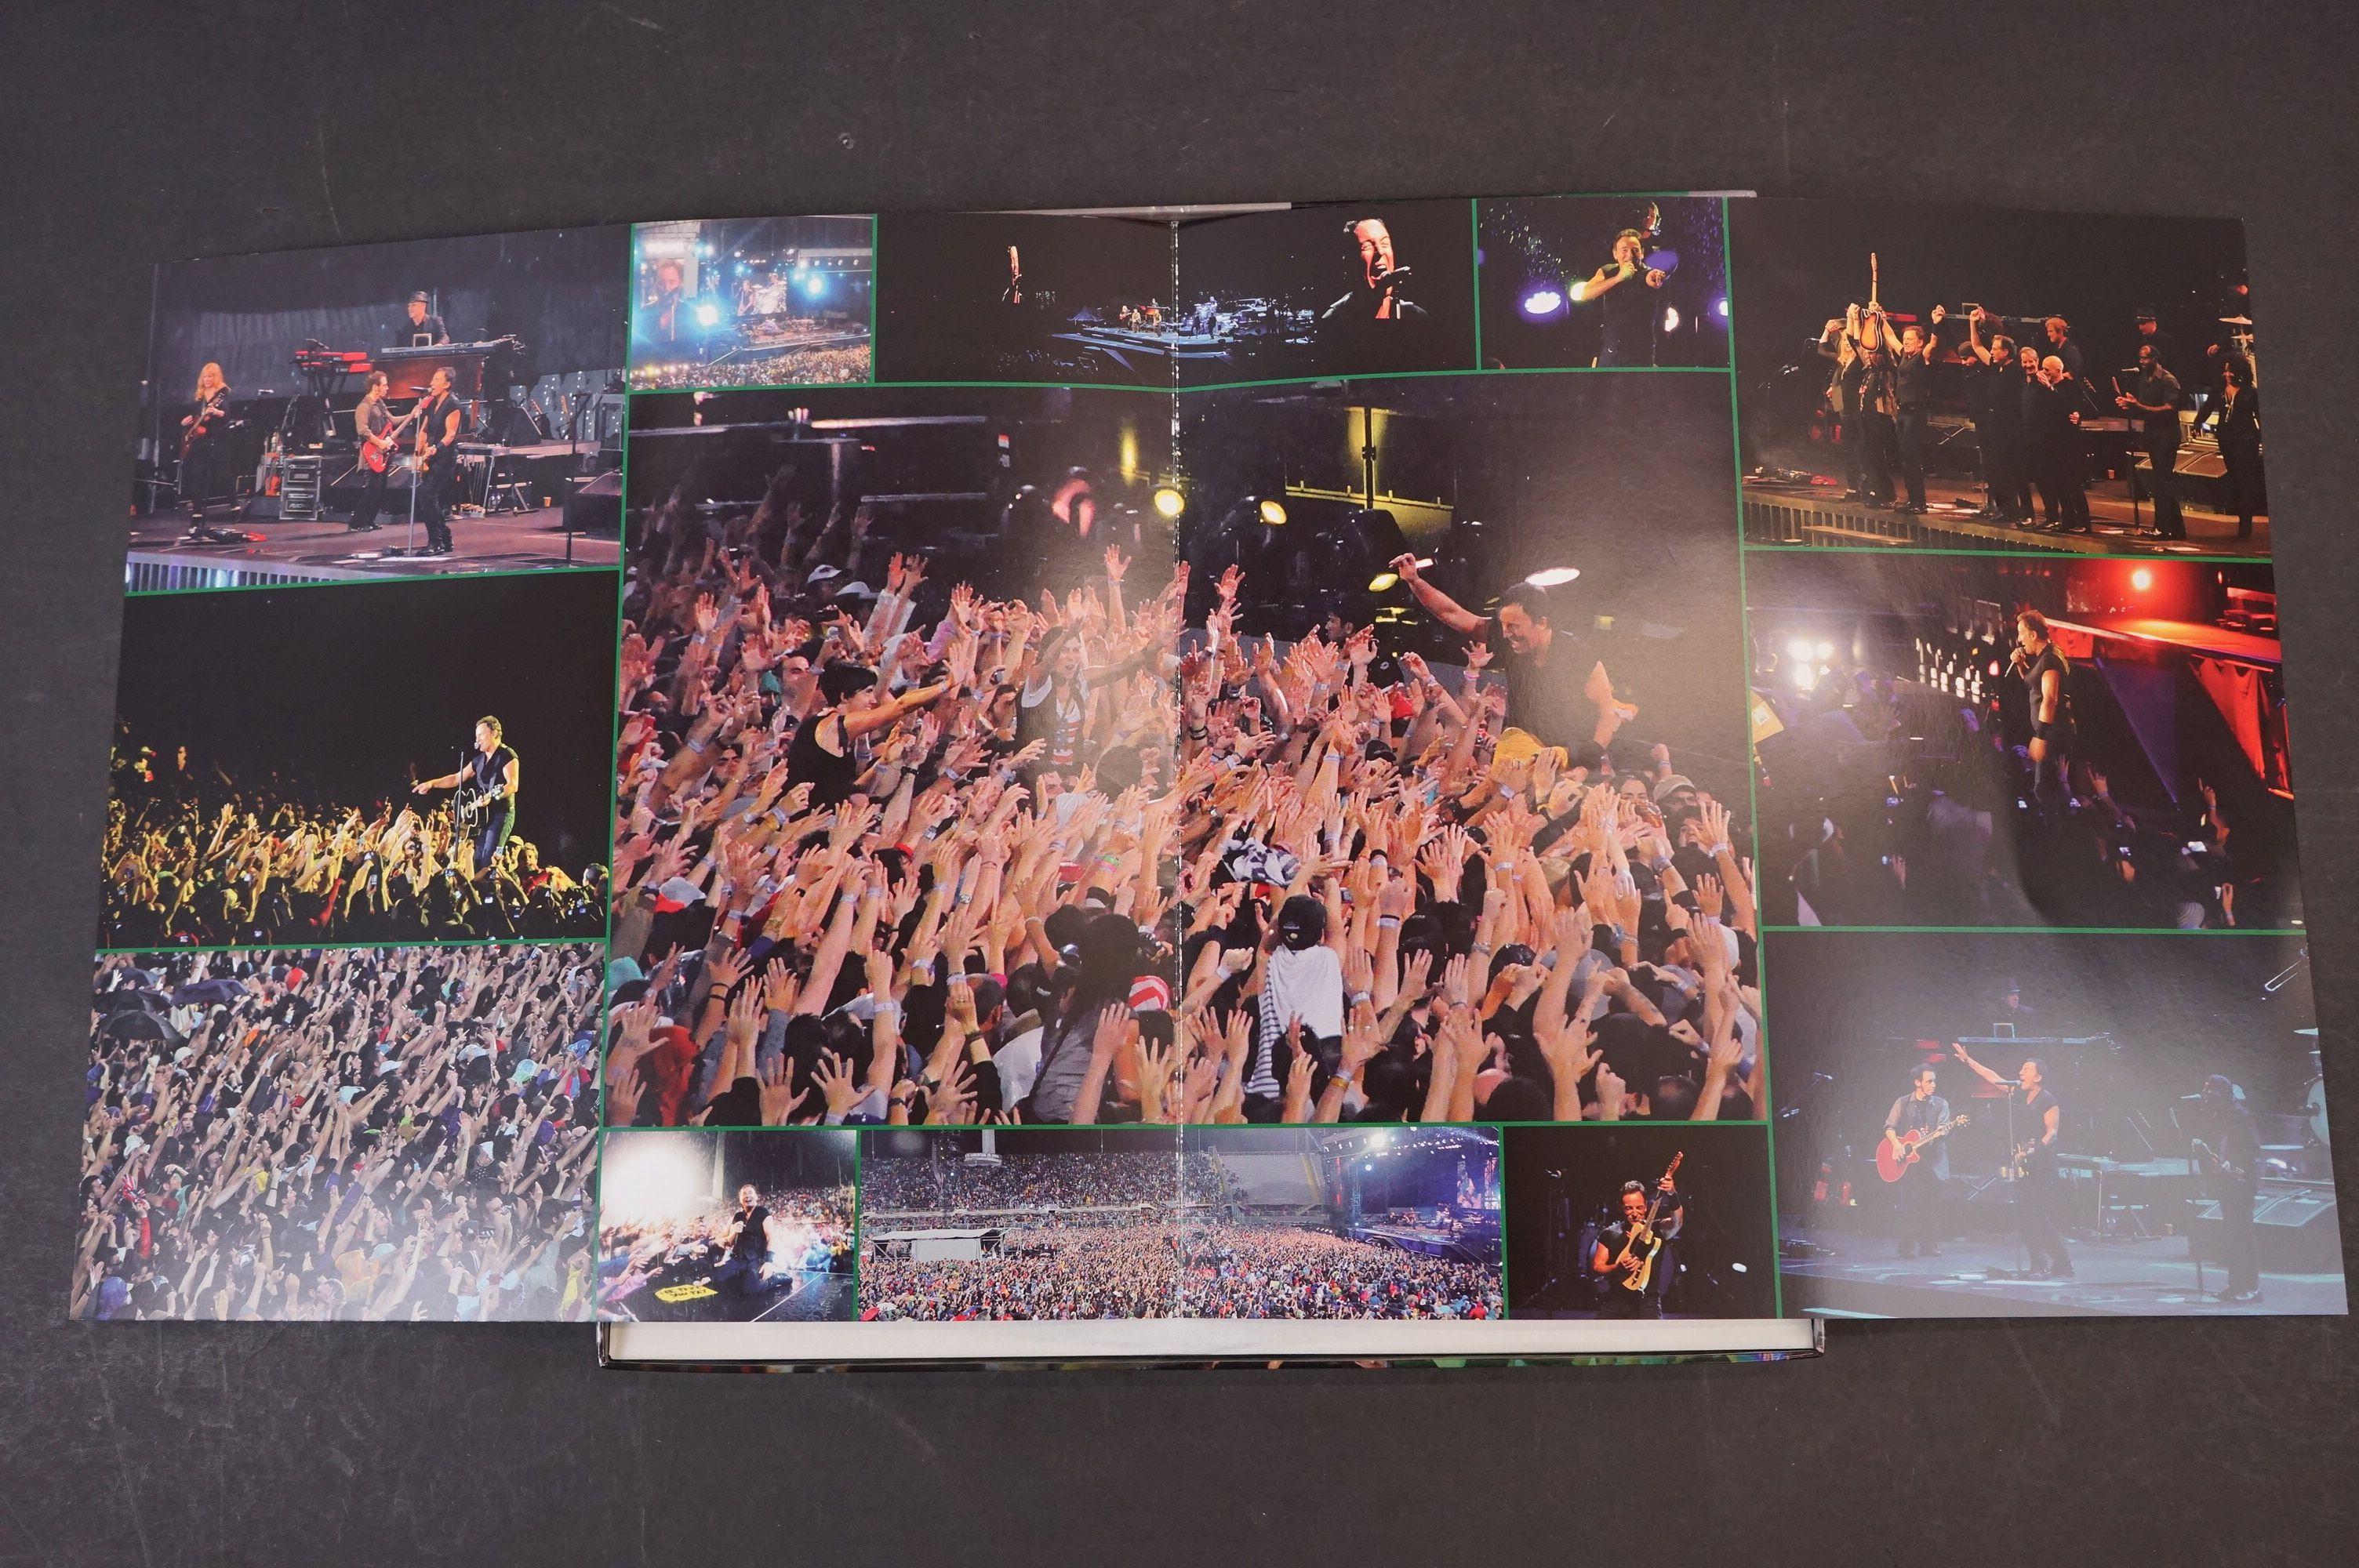 Vinyl - ltd edn Bruce Springsteen and The E Street Band A Firenze 10.06.2012 5 LP 3 CD 1 DVD heavy - Image 3 of 10